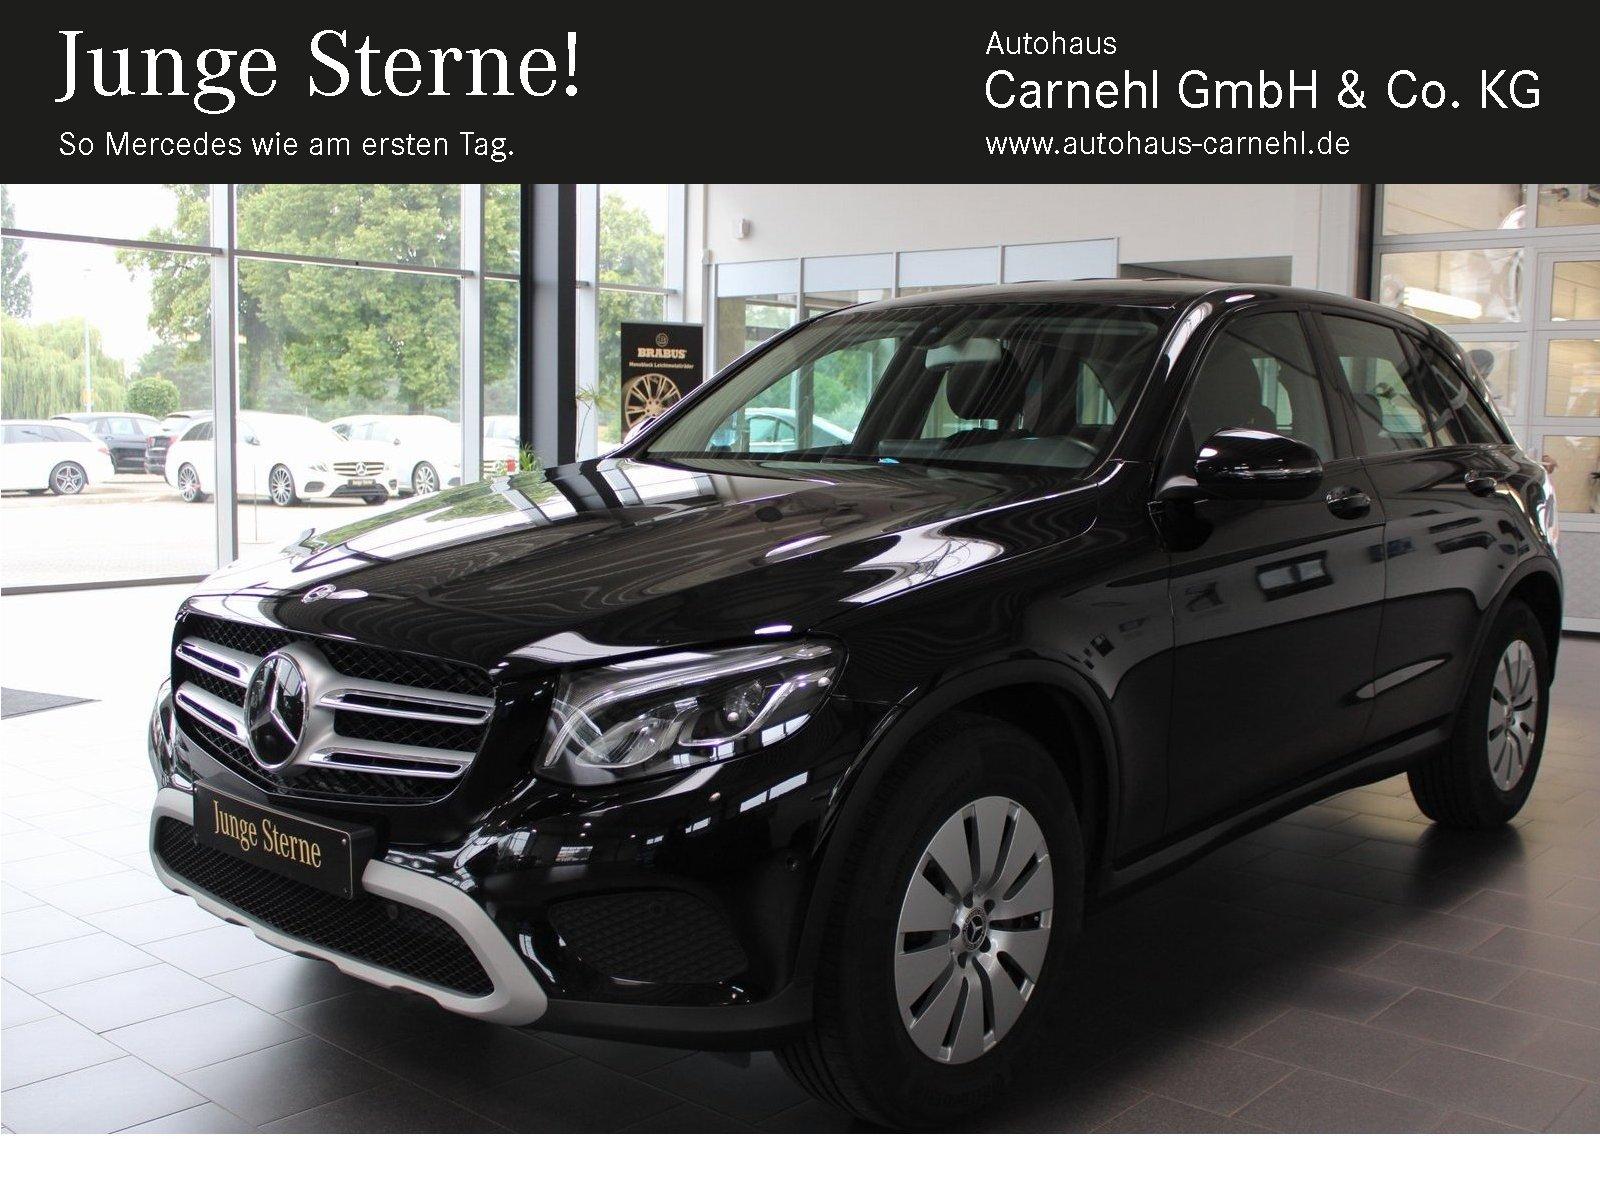 Mercedes-Benz GLC 250 d 4M+Distronic+AHK+LEDsw+PArkassi+Garmin, Jahr 2018, Diesel